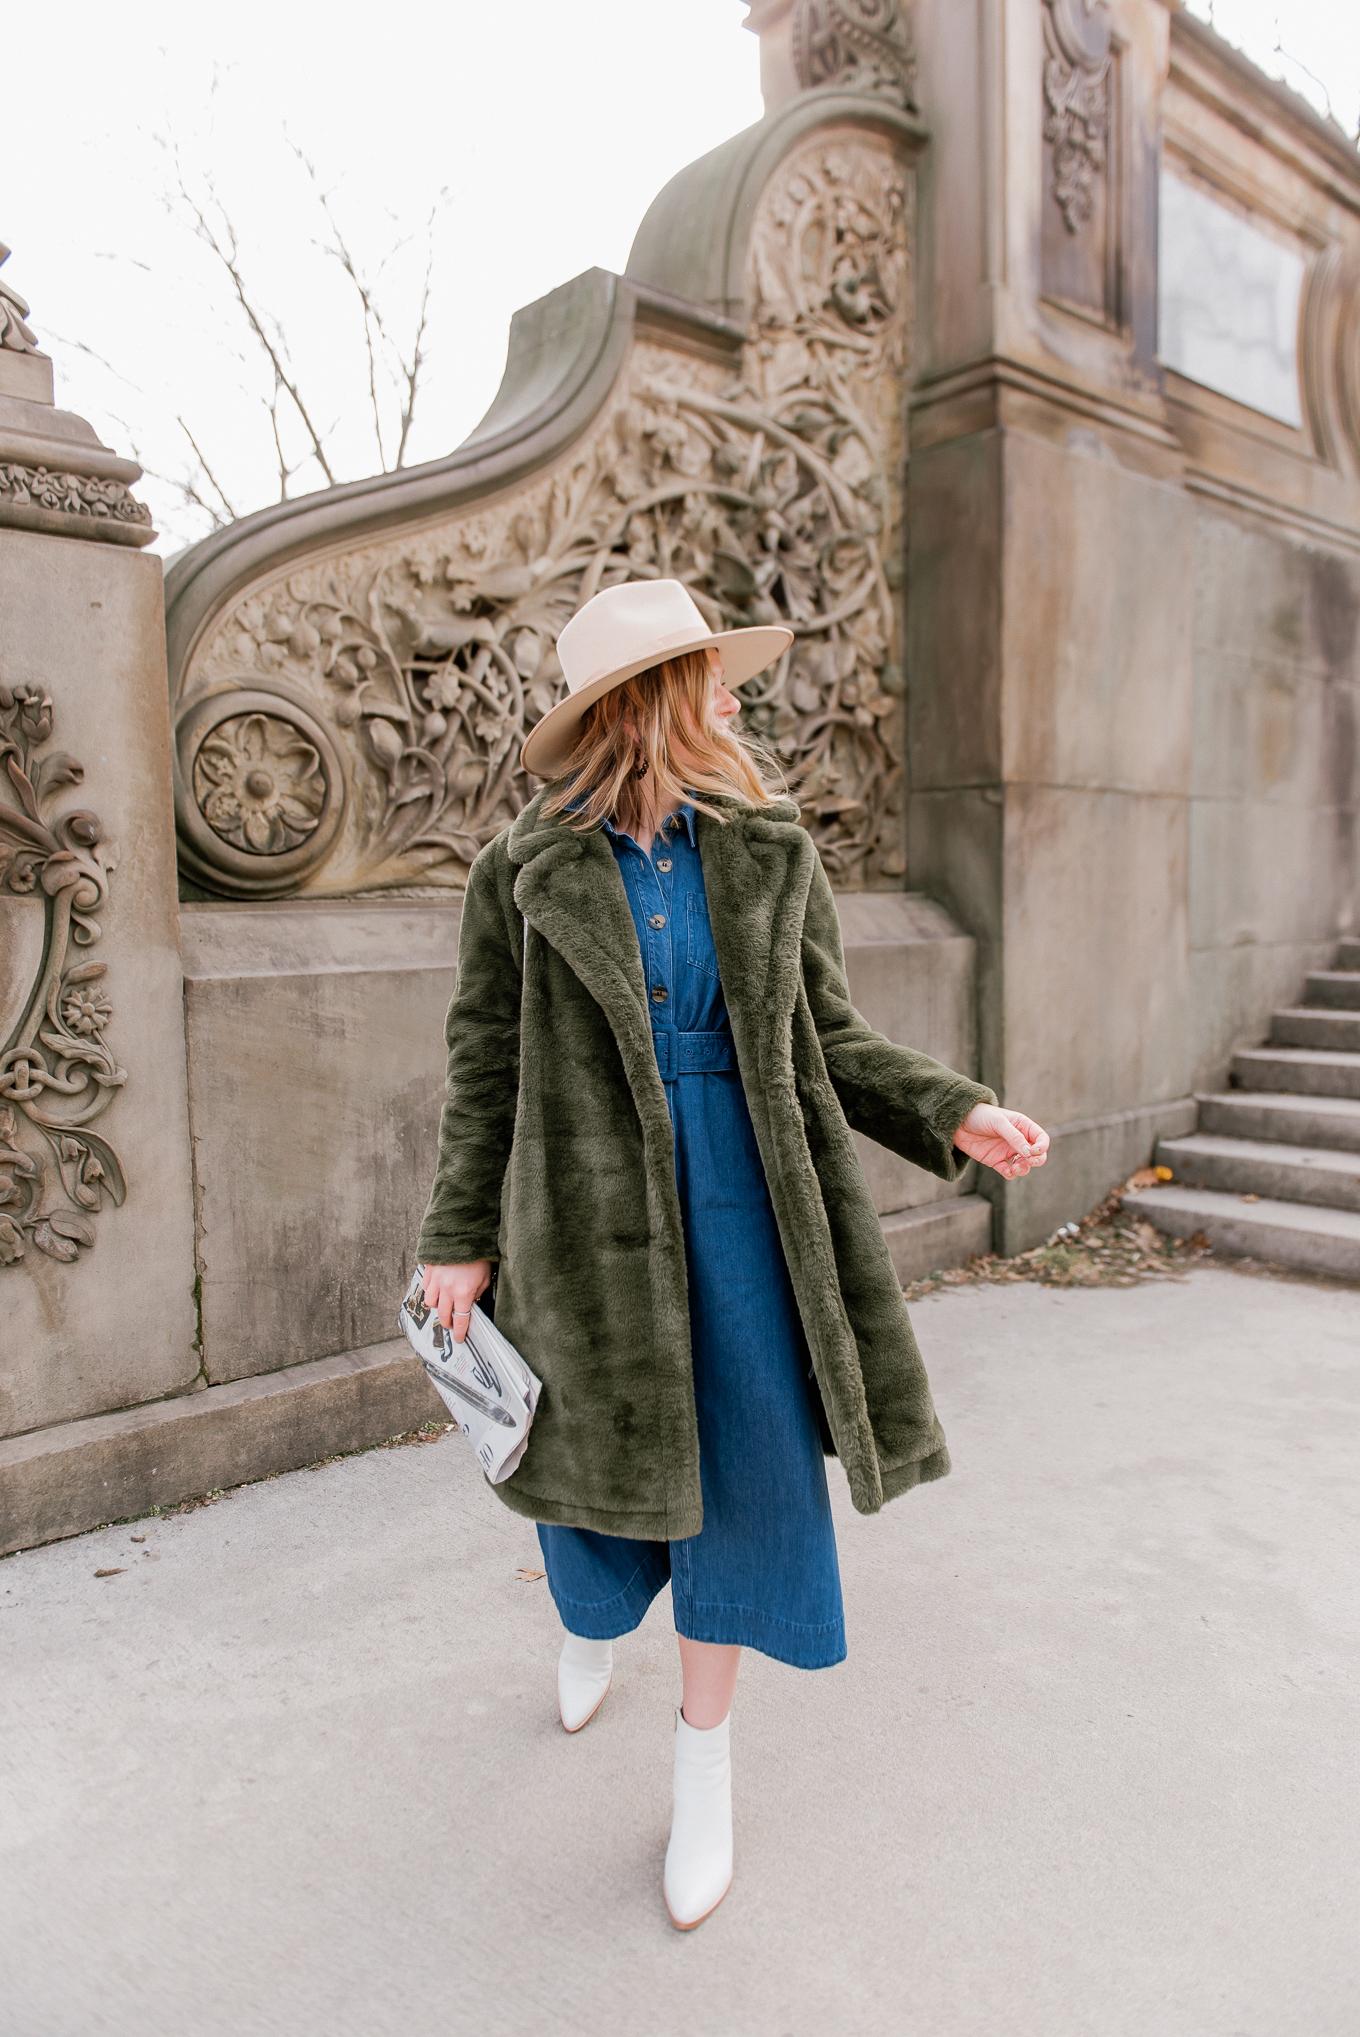 The Best Green Faux Fur Coats under $200 - Louella Reese